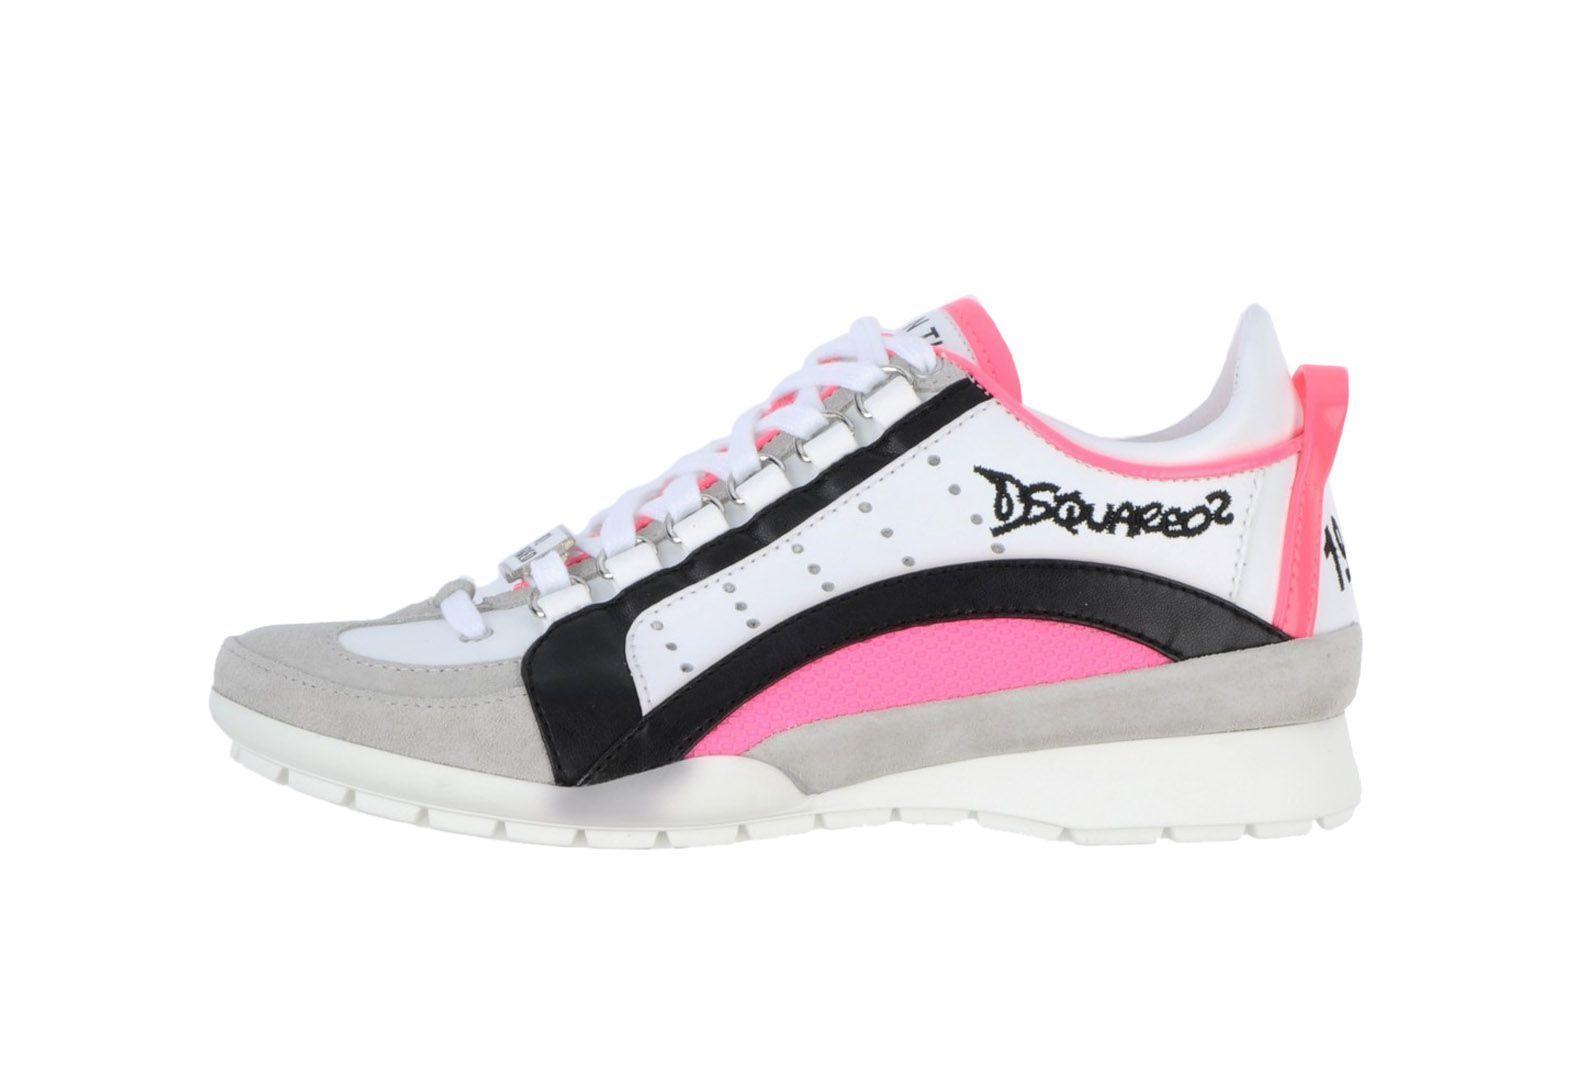 #Dsquared sneakers dames roze wit zwart « I Love #sneakers, gewoon alle  sneakers